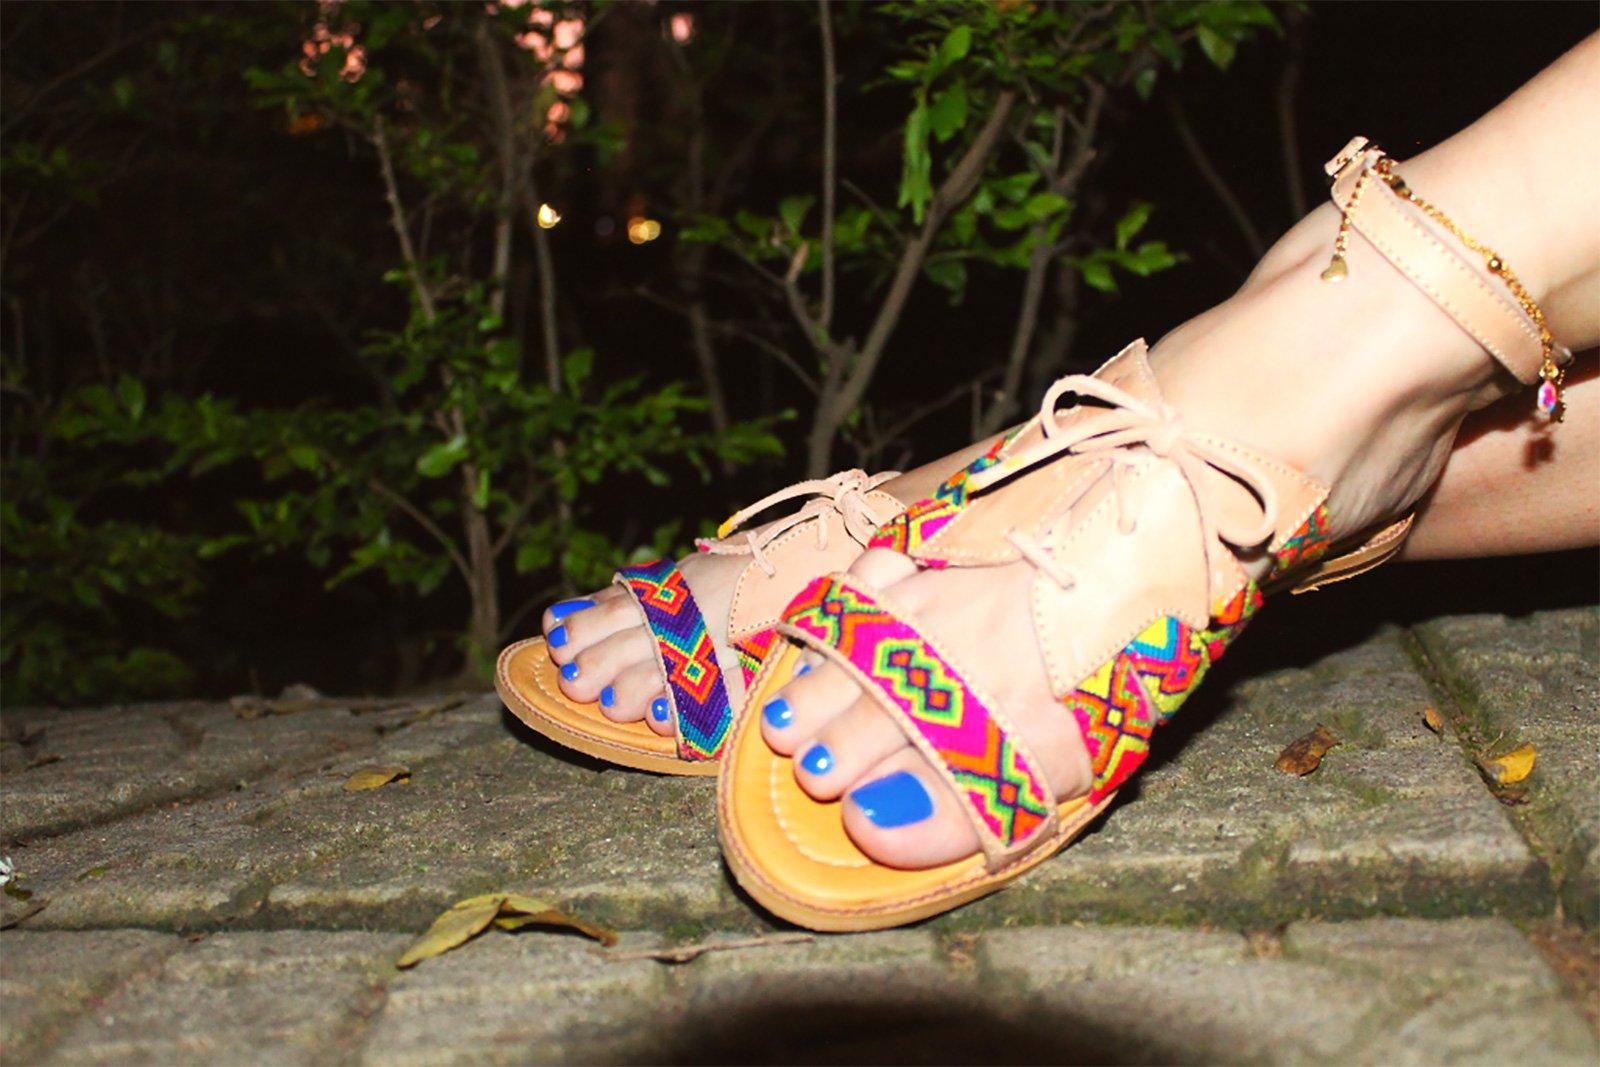 Iwa Sandales Multicolores WayuuCuir Sanbraz Artisanales ZXuPkTlwOi